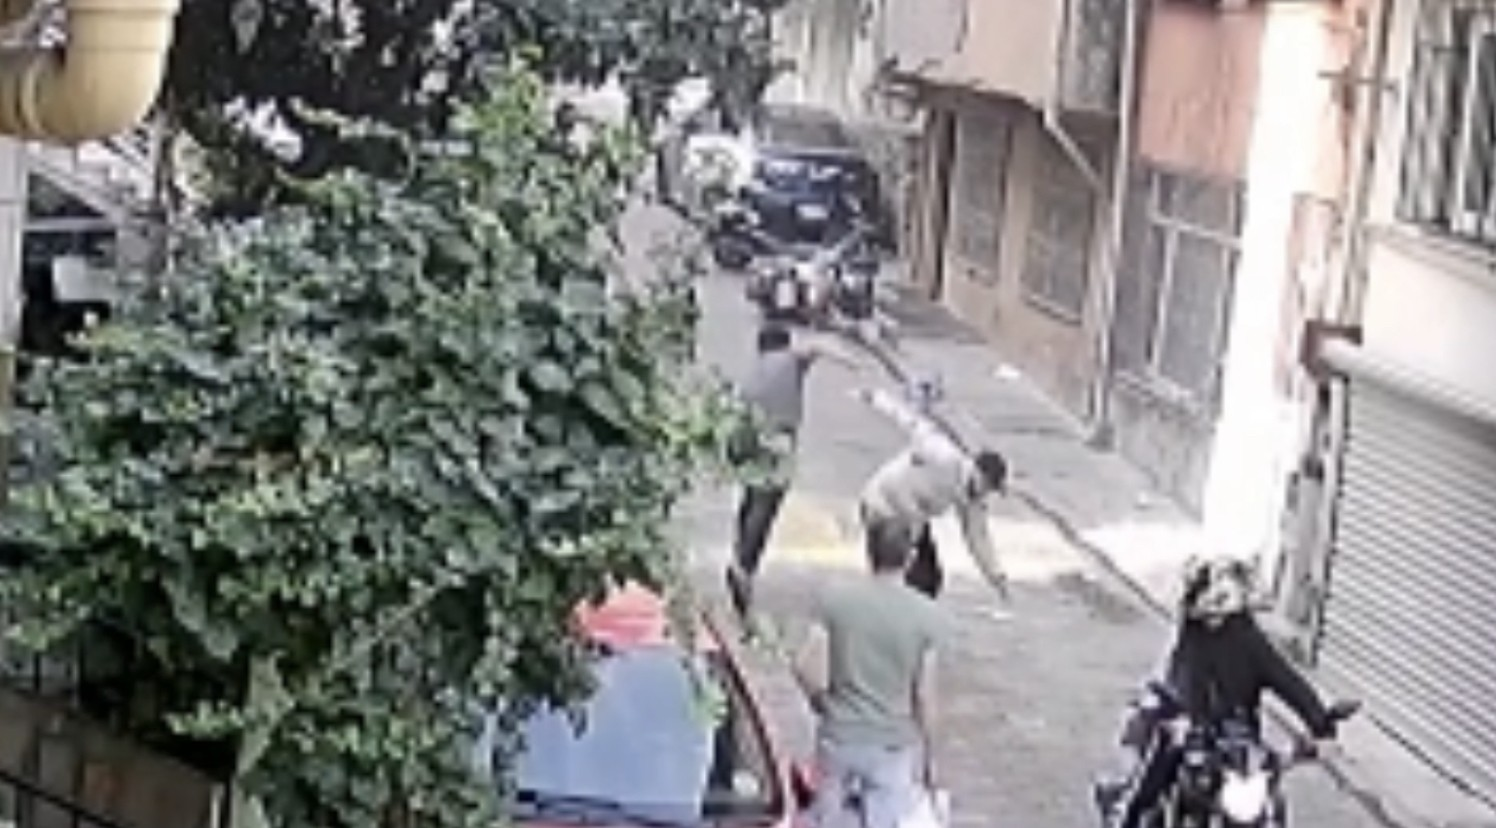 İstanbul'da bıçaklı gasp dehşeti kamerada